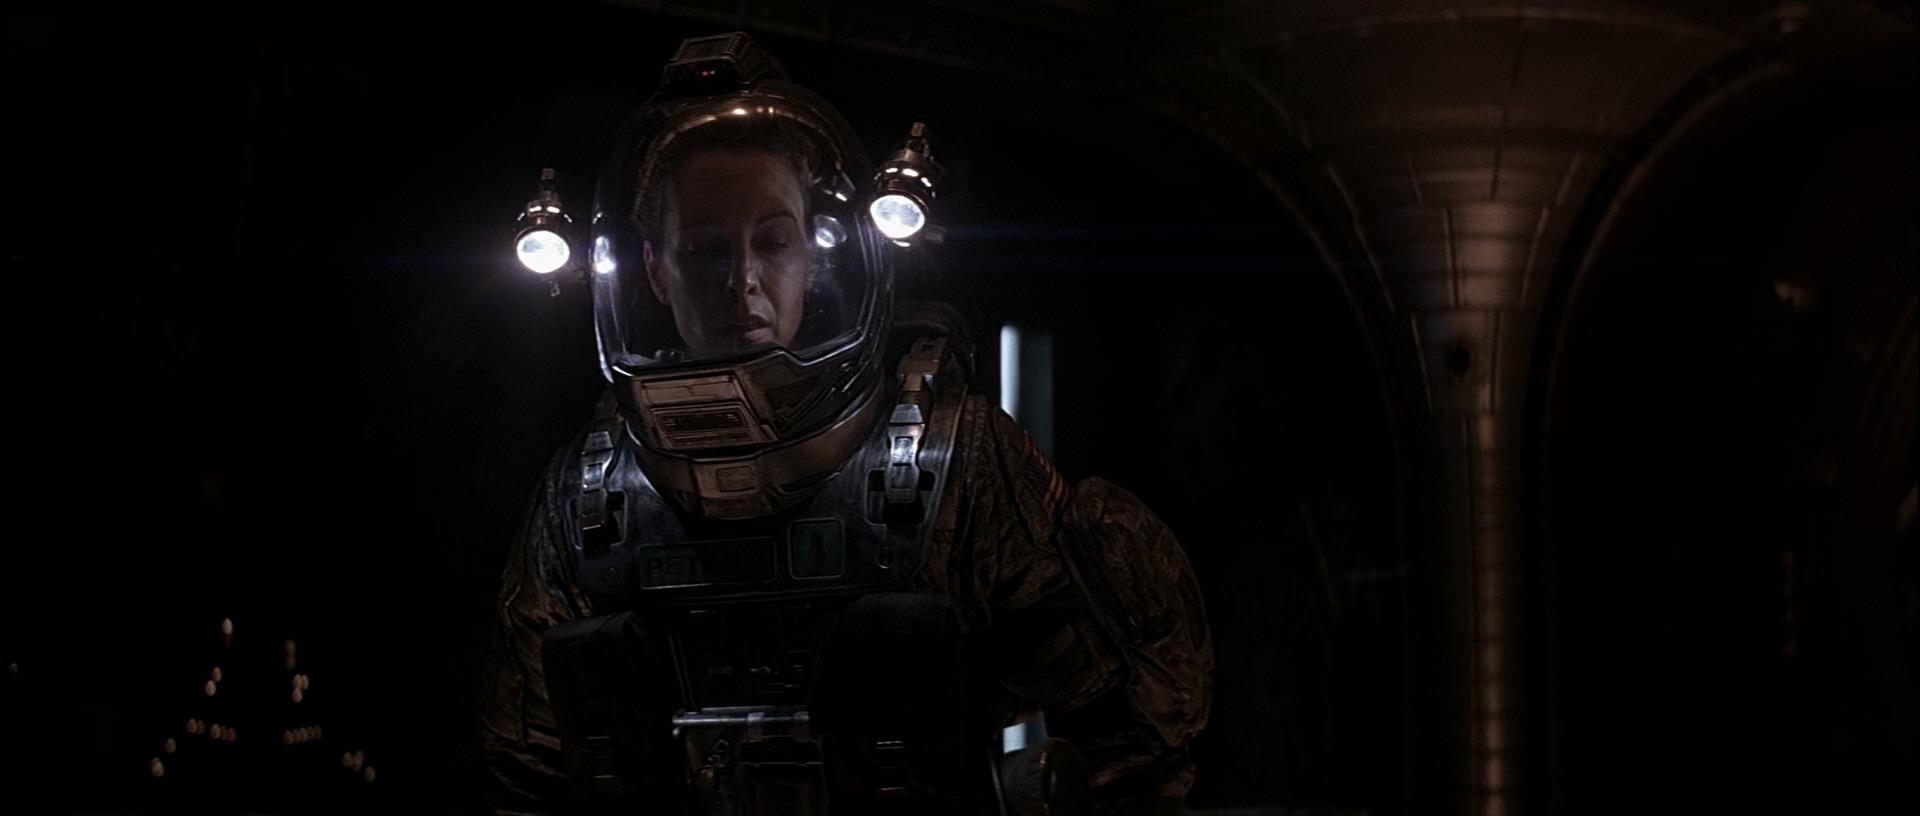 Event Horizon - Punto di Non Ritorno 1997 BDRip 1080p Ita Eng x265-NAHOM.mkv_20161125_132034.723.jpg